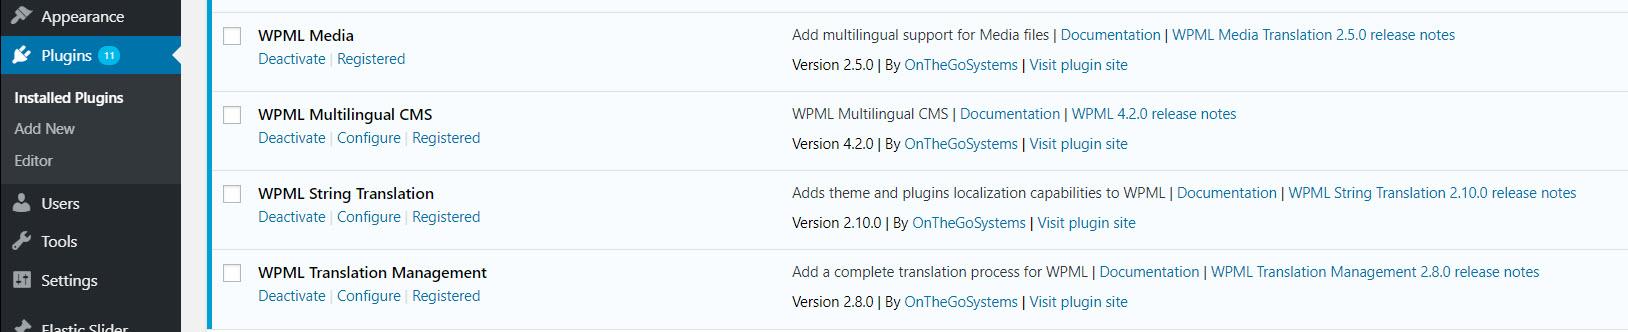 wpml plugins in live site wordpress(14feb19).jpg